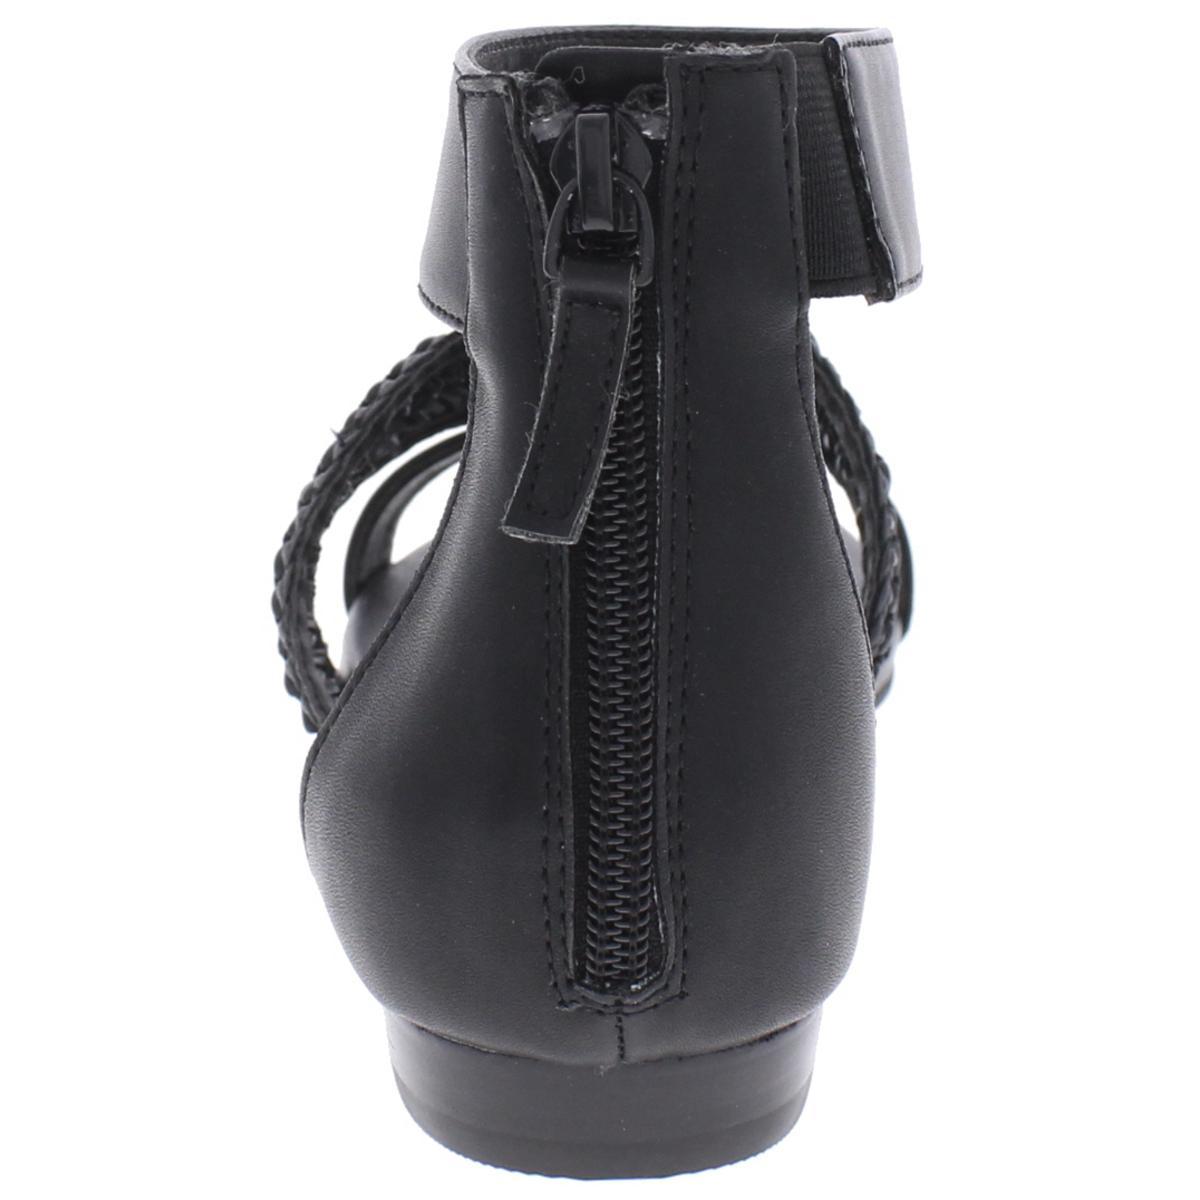 Tahari-Womens-Dorm-Open-Toe-Textured-Ankle-Flat-Sandals-Shoes-BHFO-3387 thumbnail 7